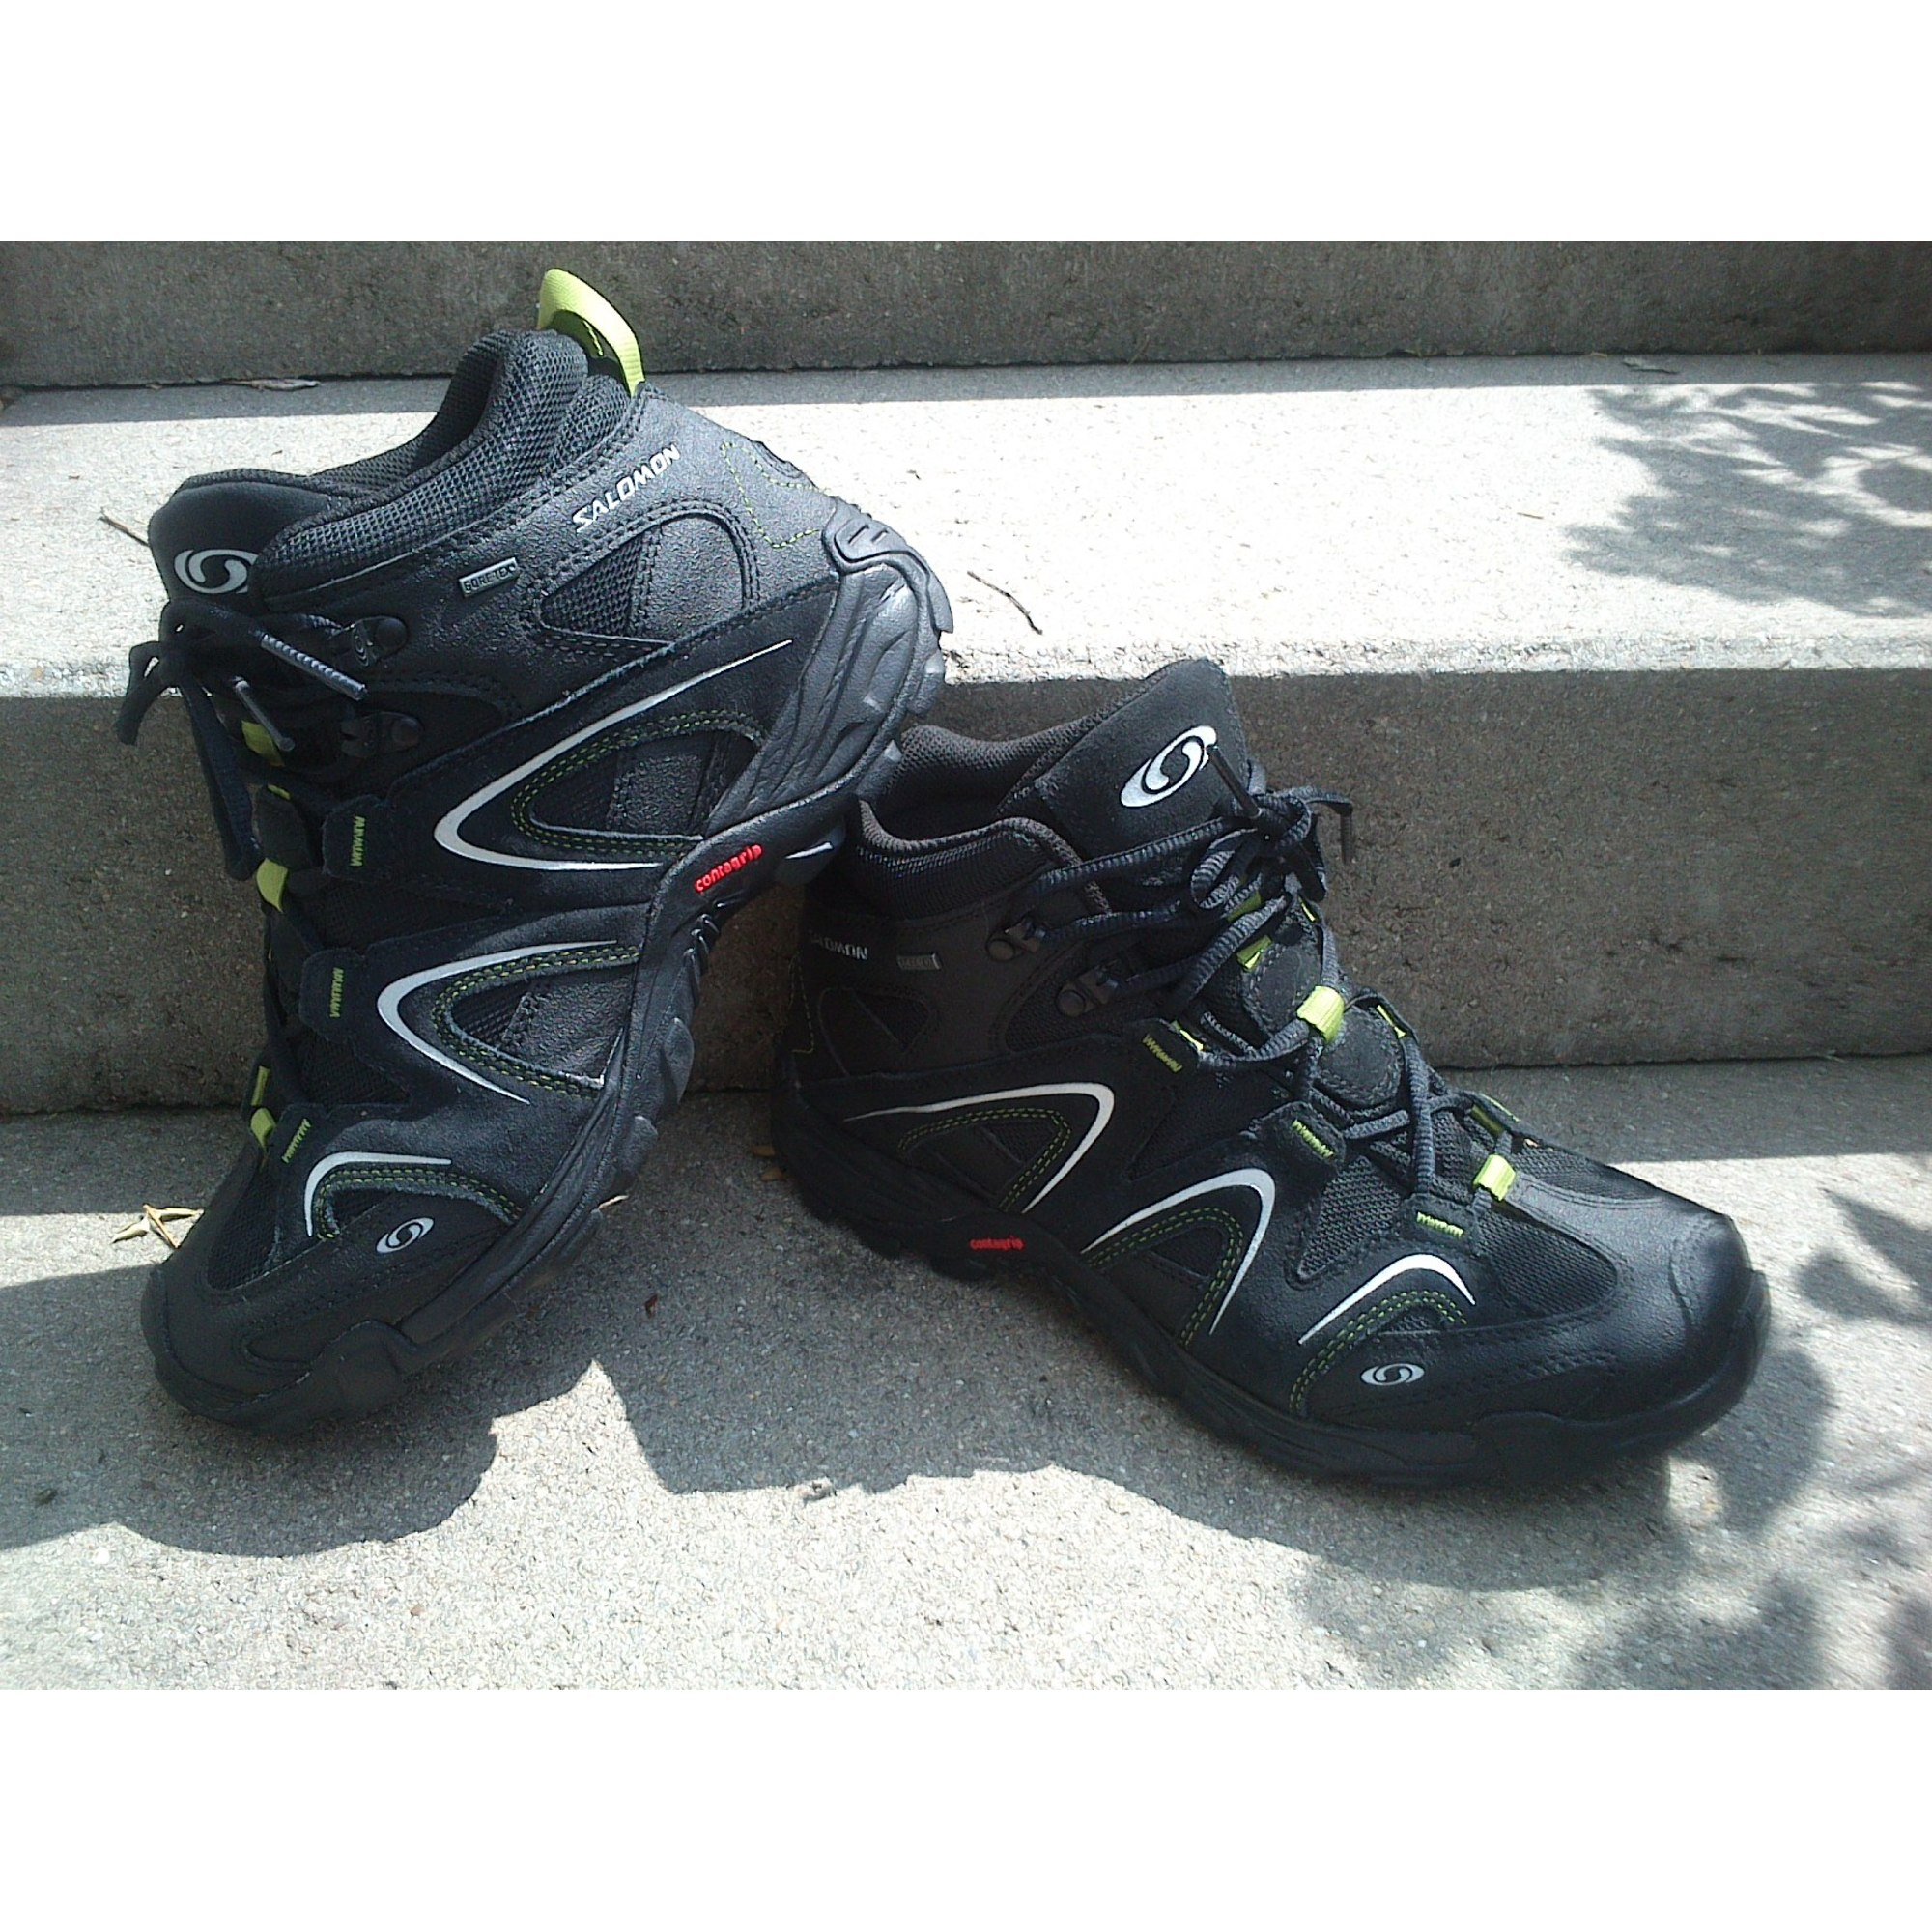 sport SALOMON de noir 1587568 42 Chaussures iuOTPZXk